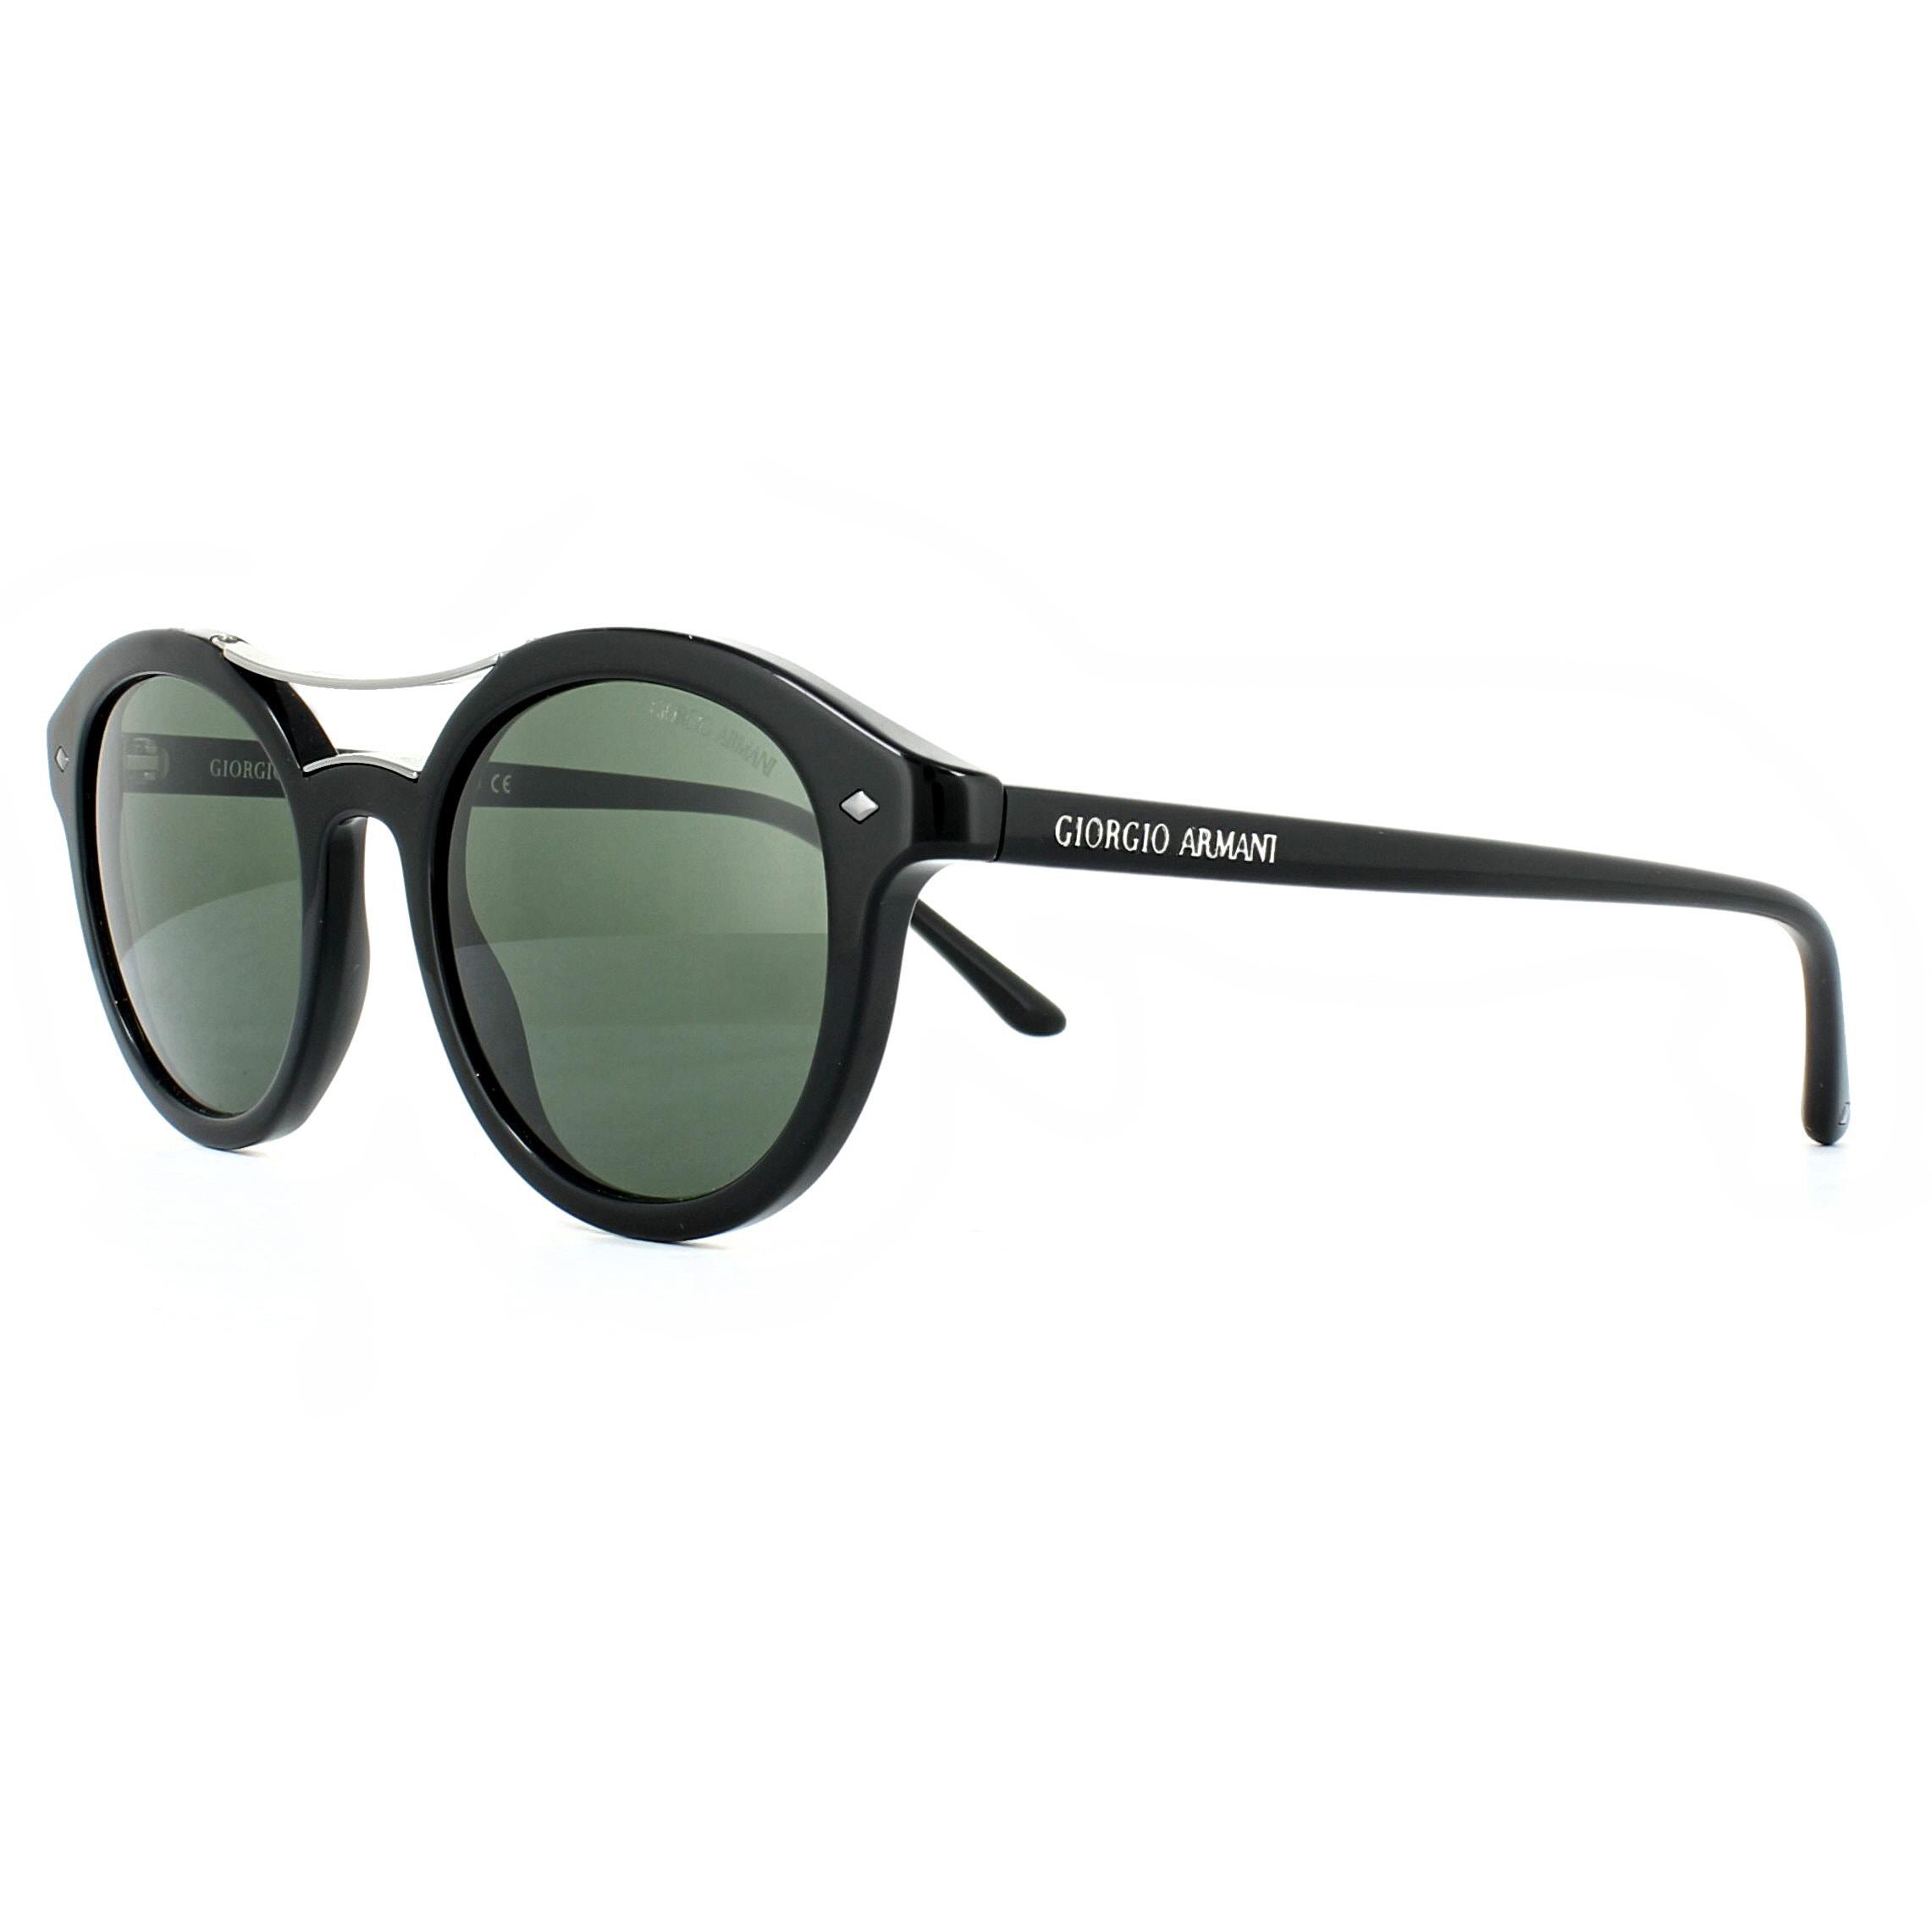 ce21fefc3d59 Giorgio Armani Sunglasses AR8007 501731 Black Green 8053672567526